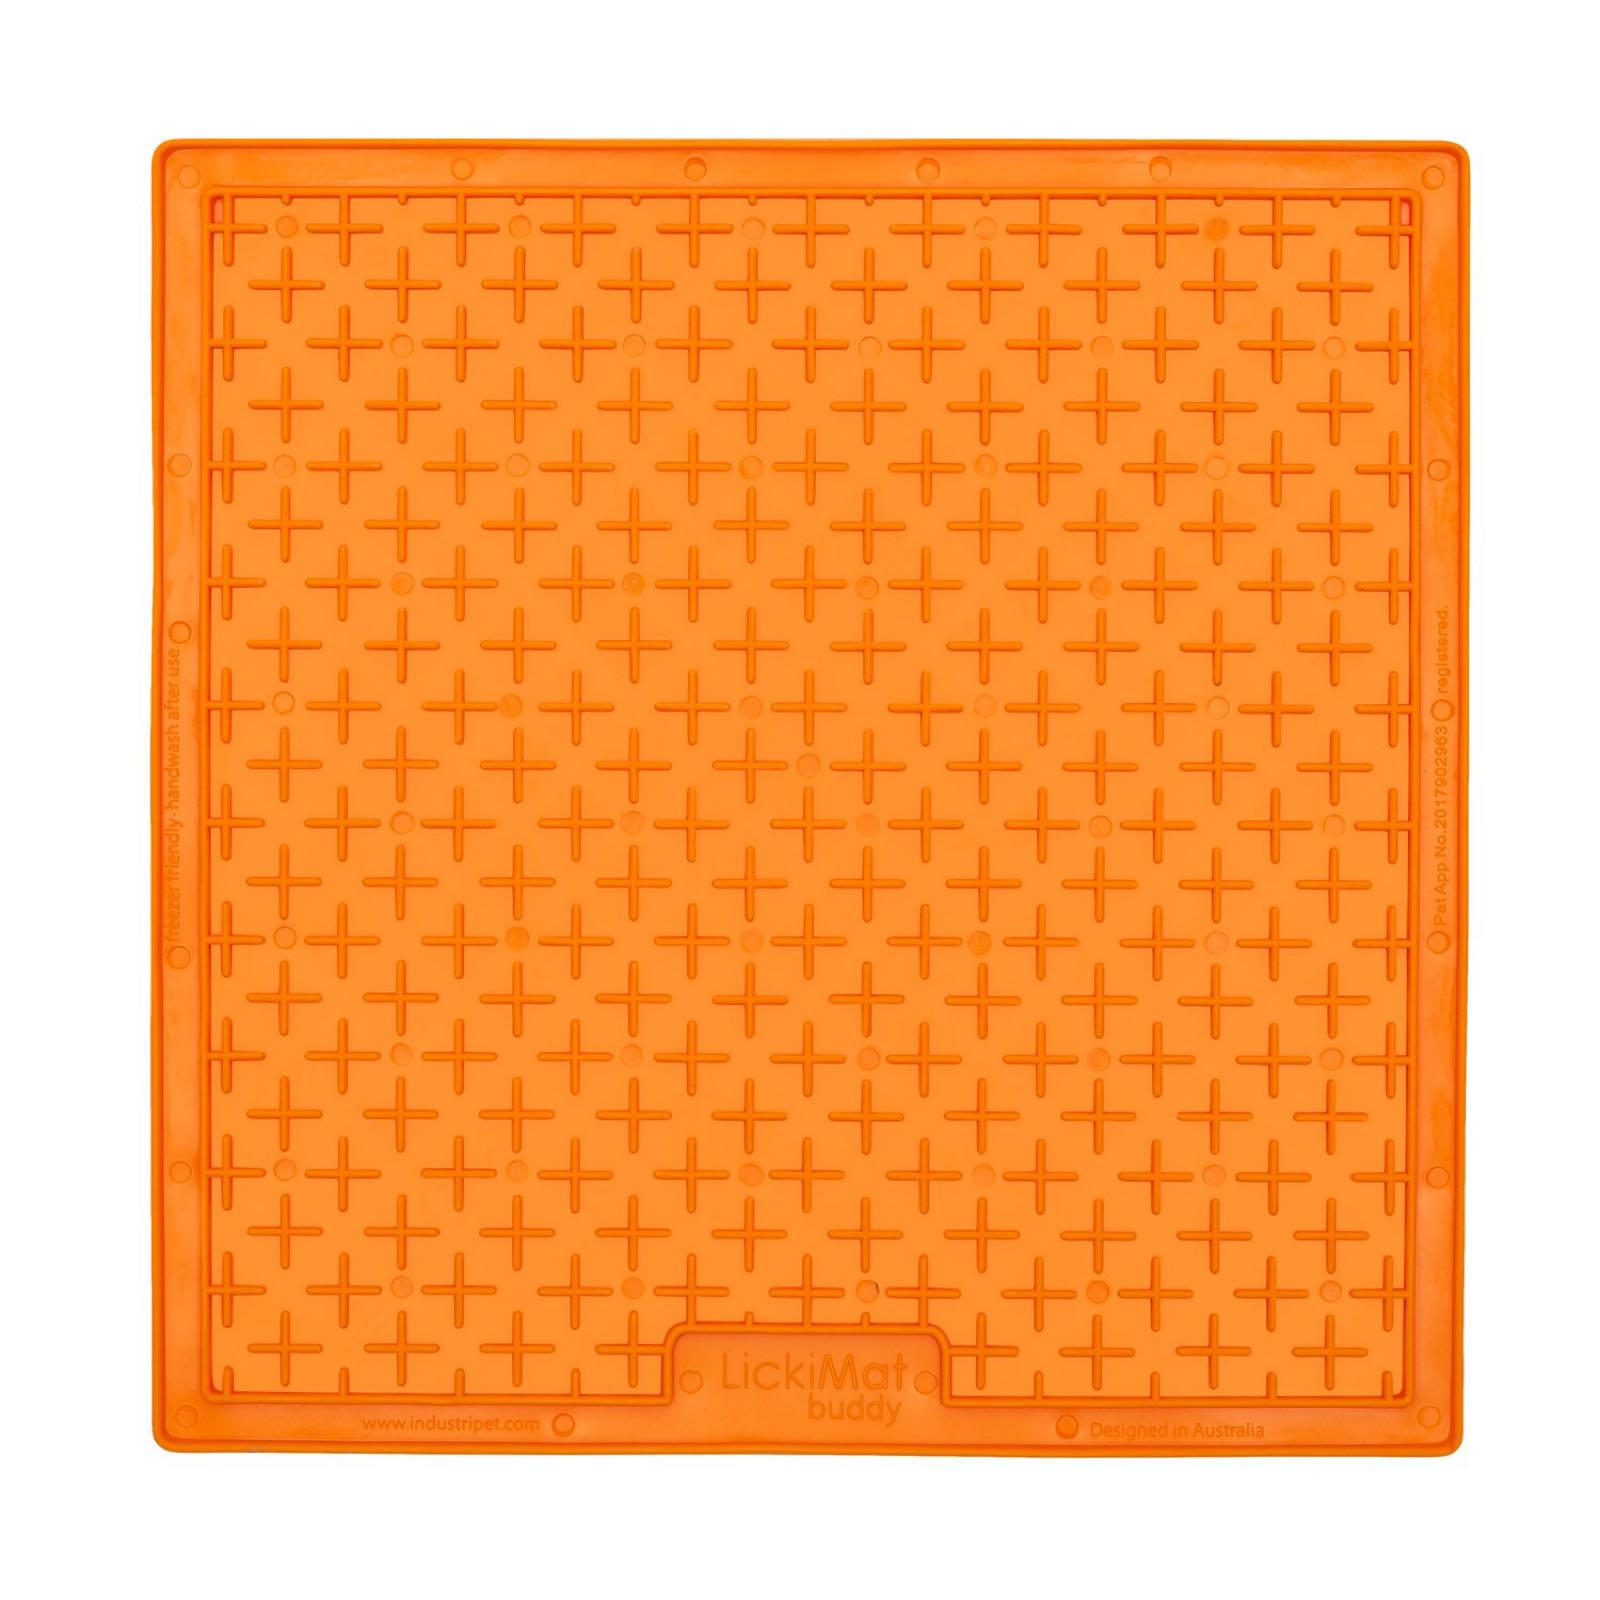 LickiMat Buddy Orange